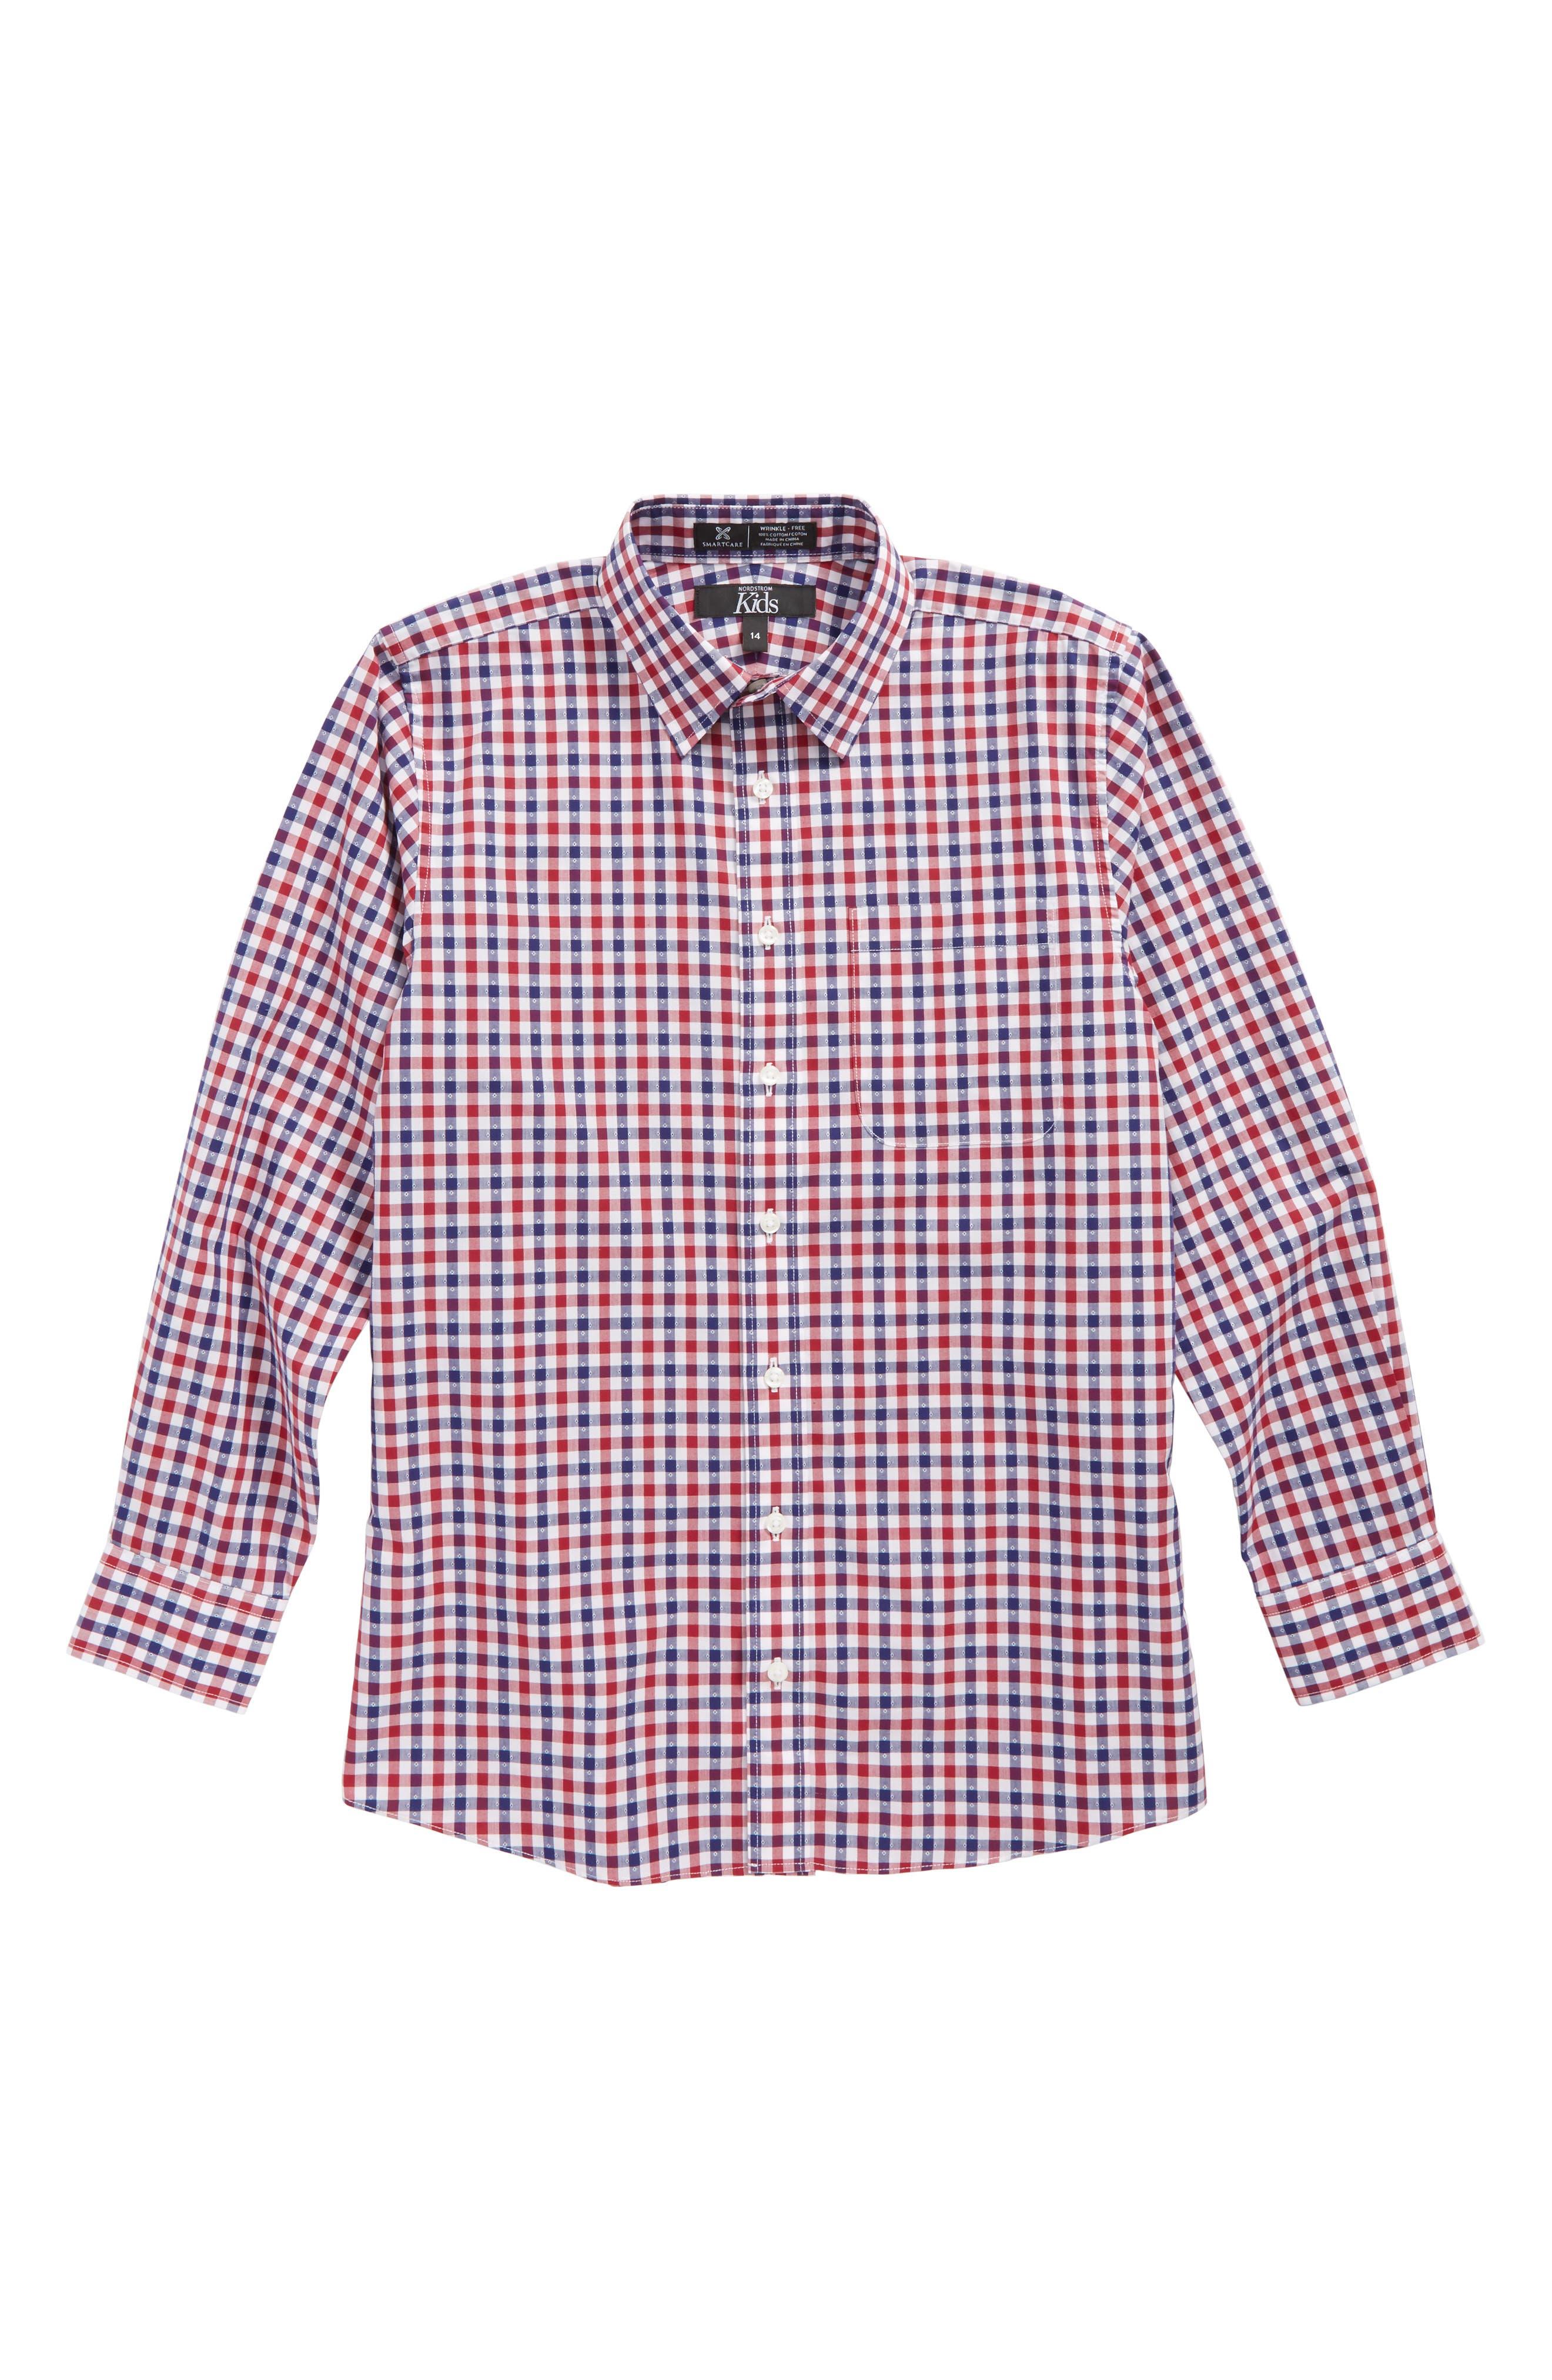 Dot Gingham Sport Shirt,                         Main,                         color, Red Tibetan-White Plaid